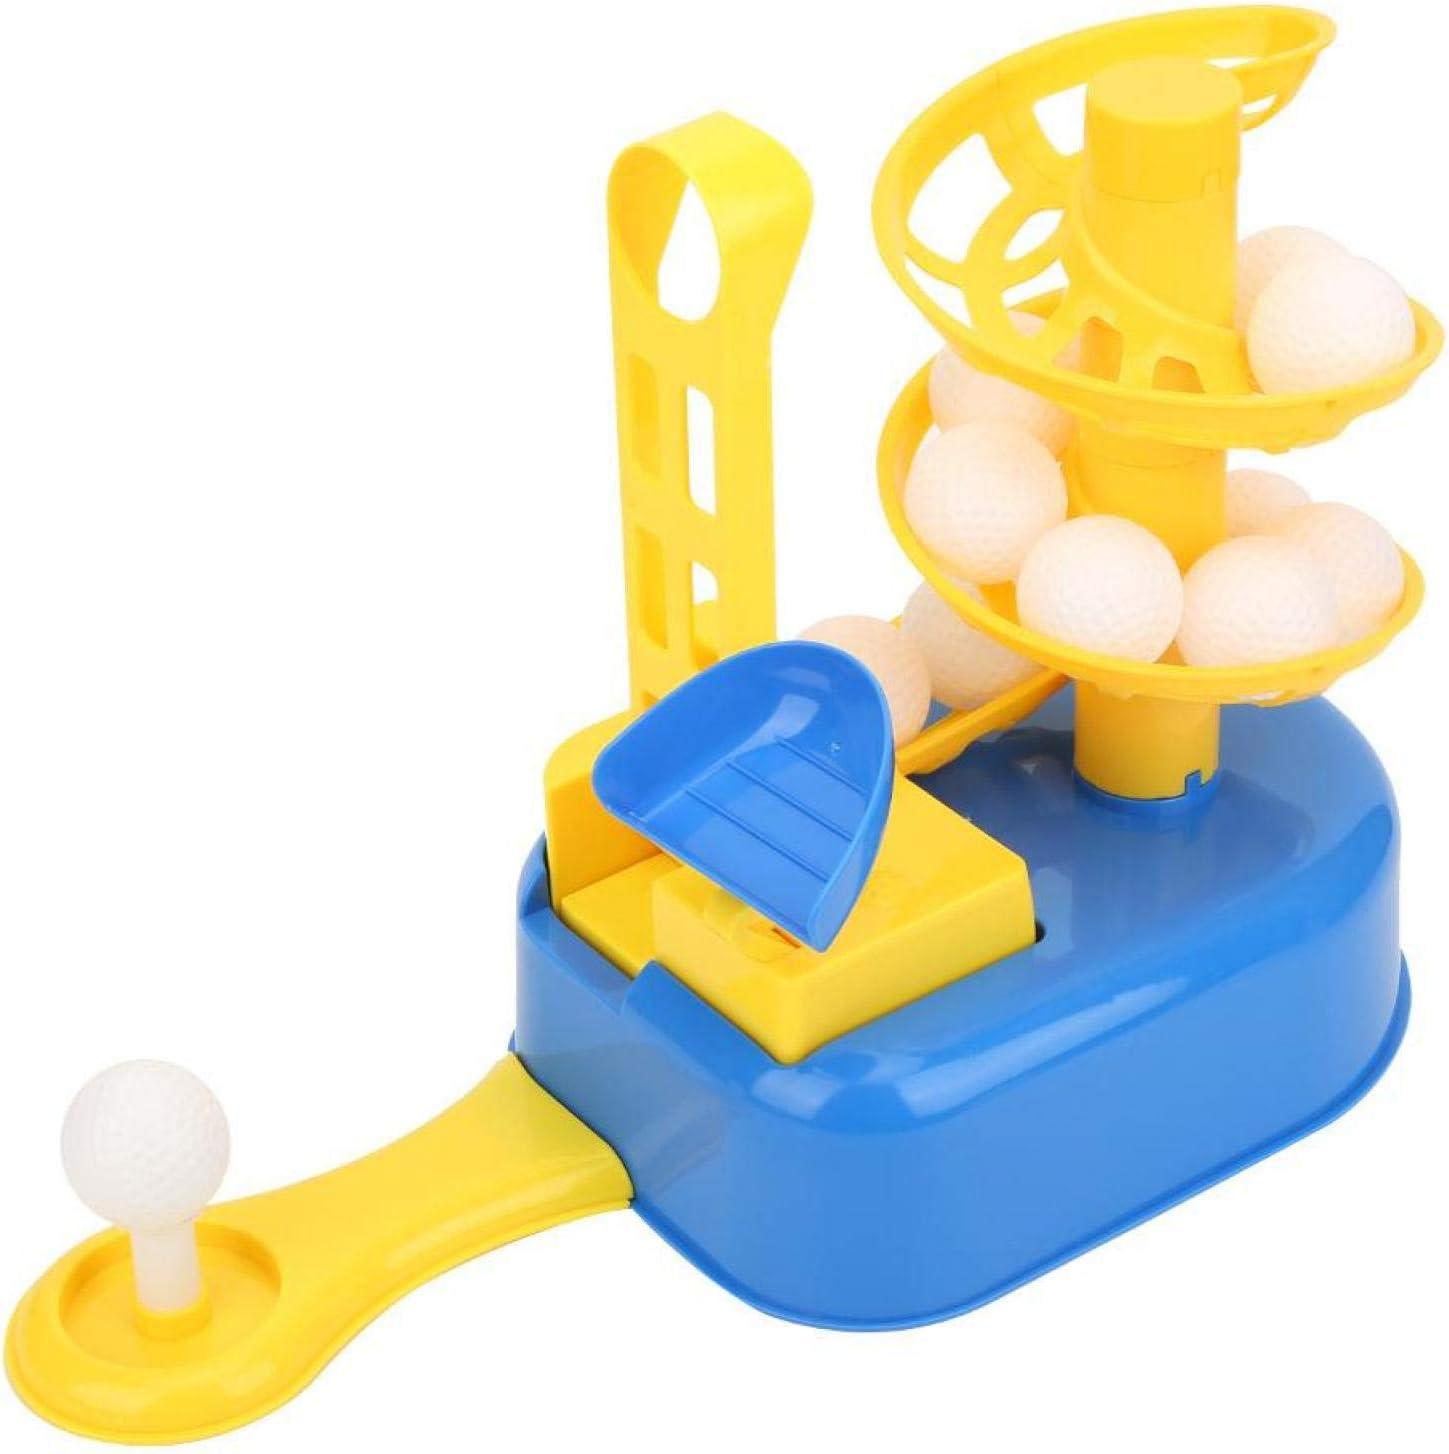 Golf Training Machine Sturdy Now on sale and Trainin Sports Safe for Durable SALENEW very popular